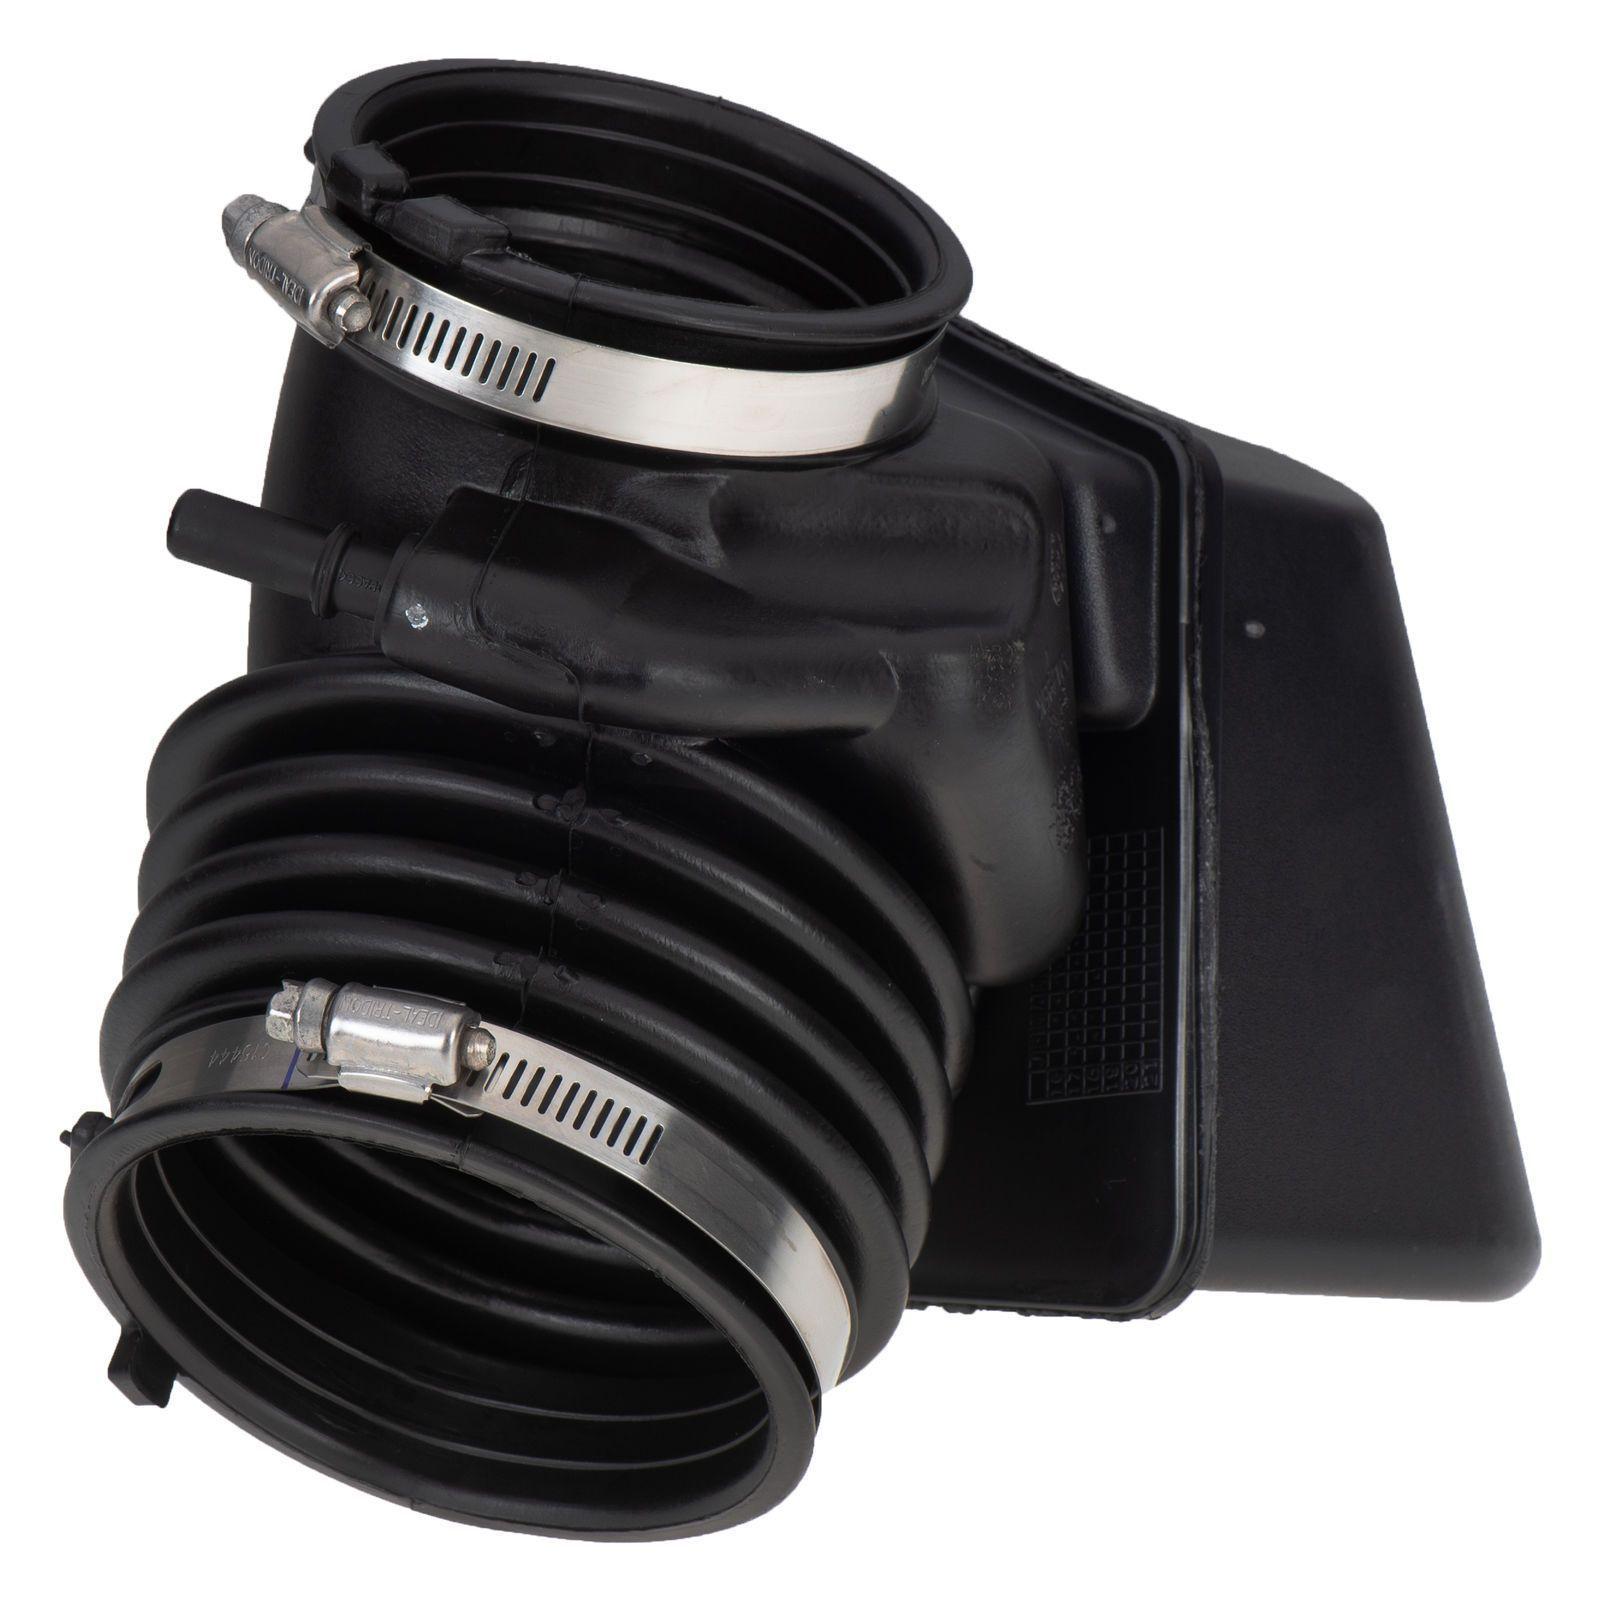 20132018 Impala XTS 3.6L Air Intake Cleaner Tube Duct